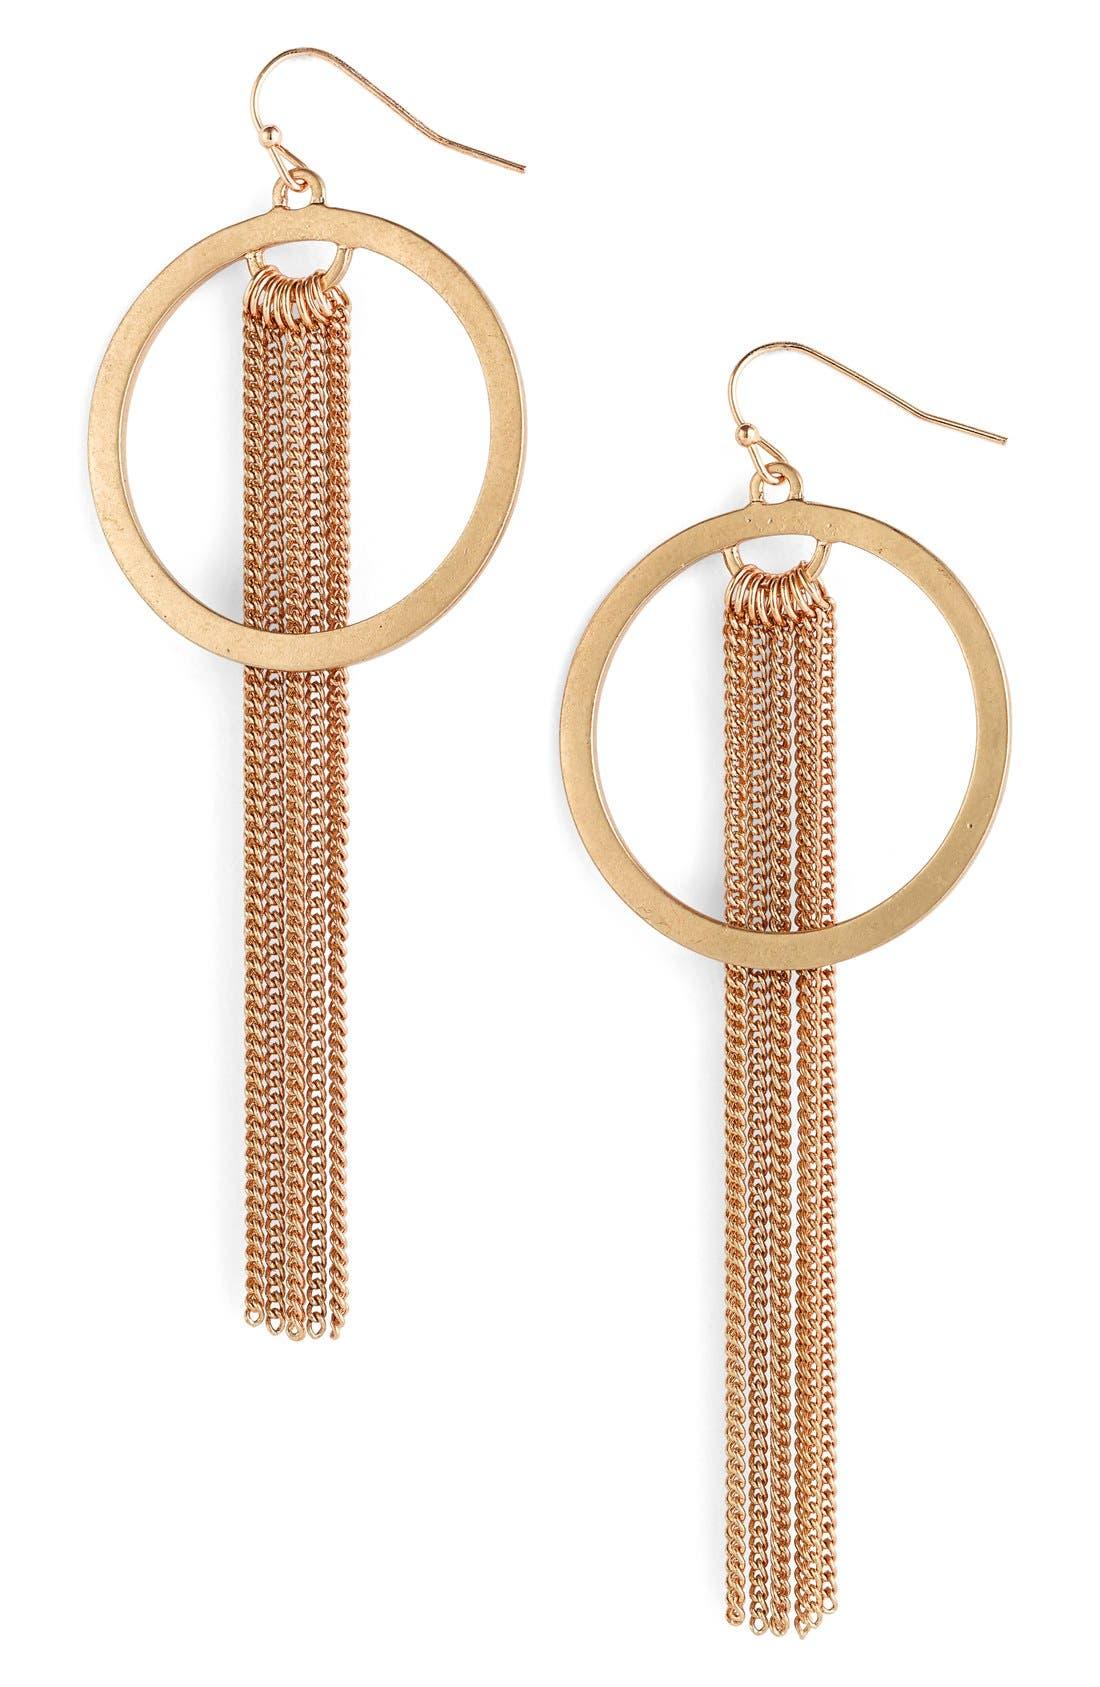 Alternate Image 1 Selected - BP. Circle Fringe Earrings